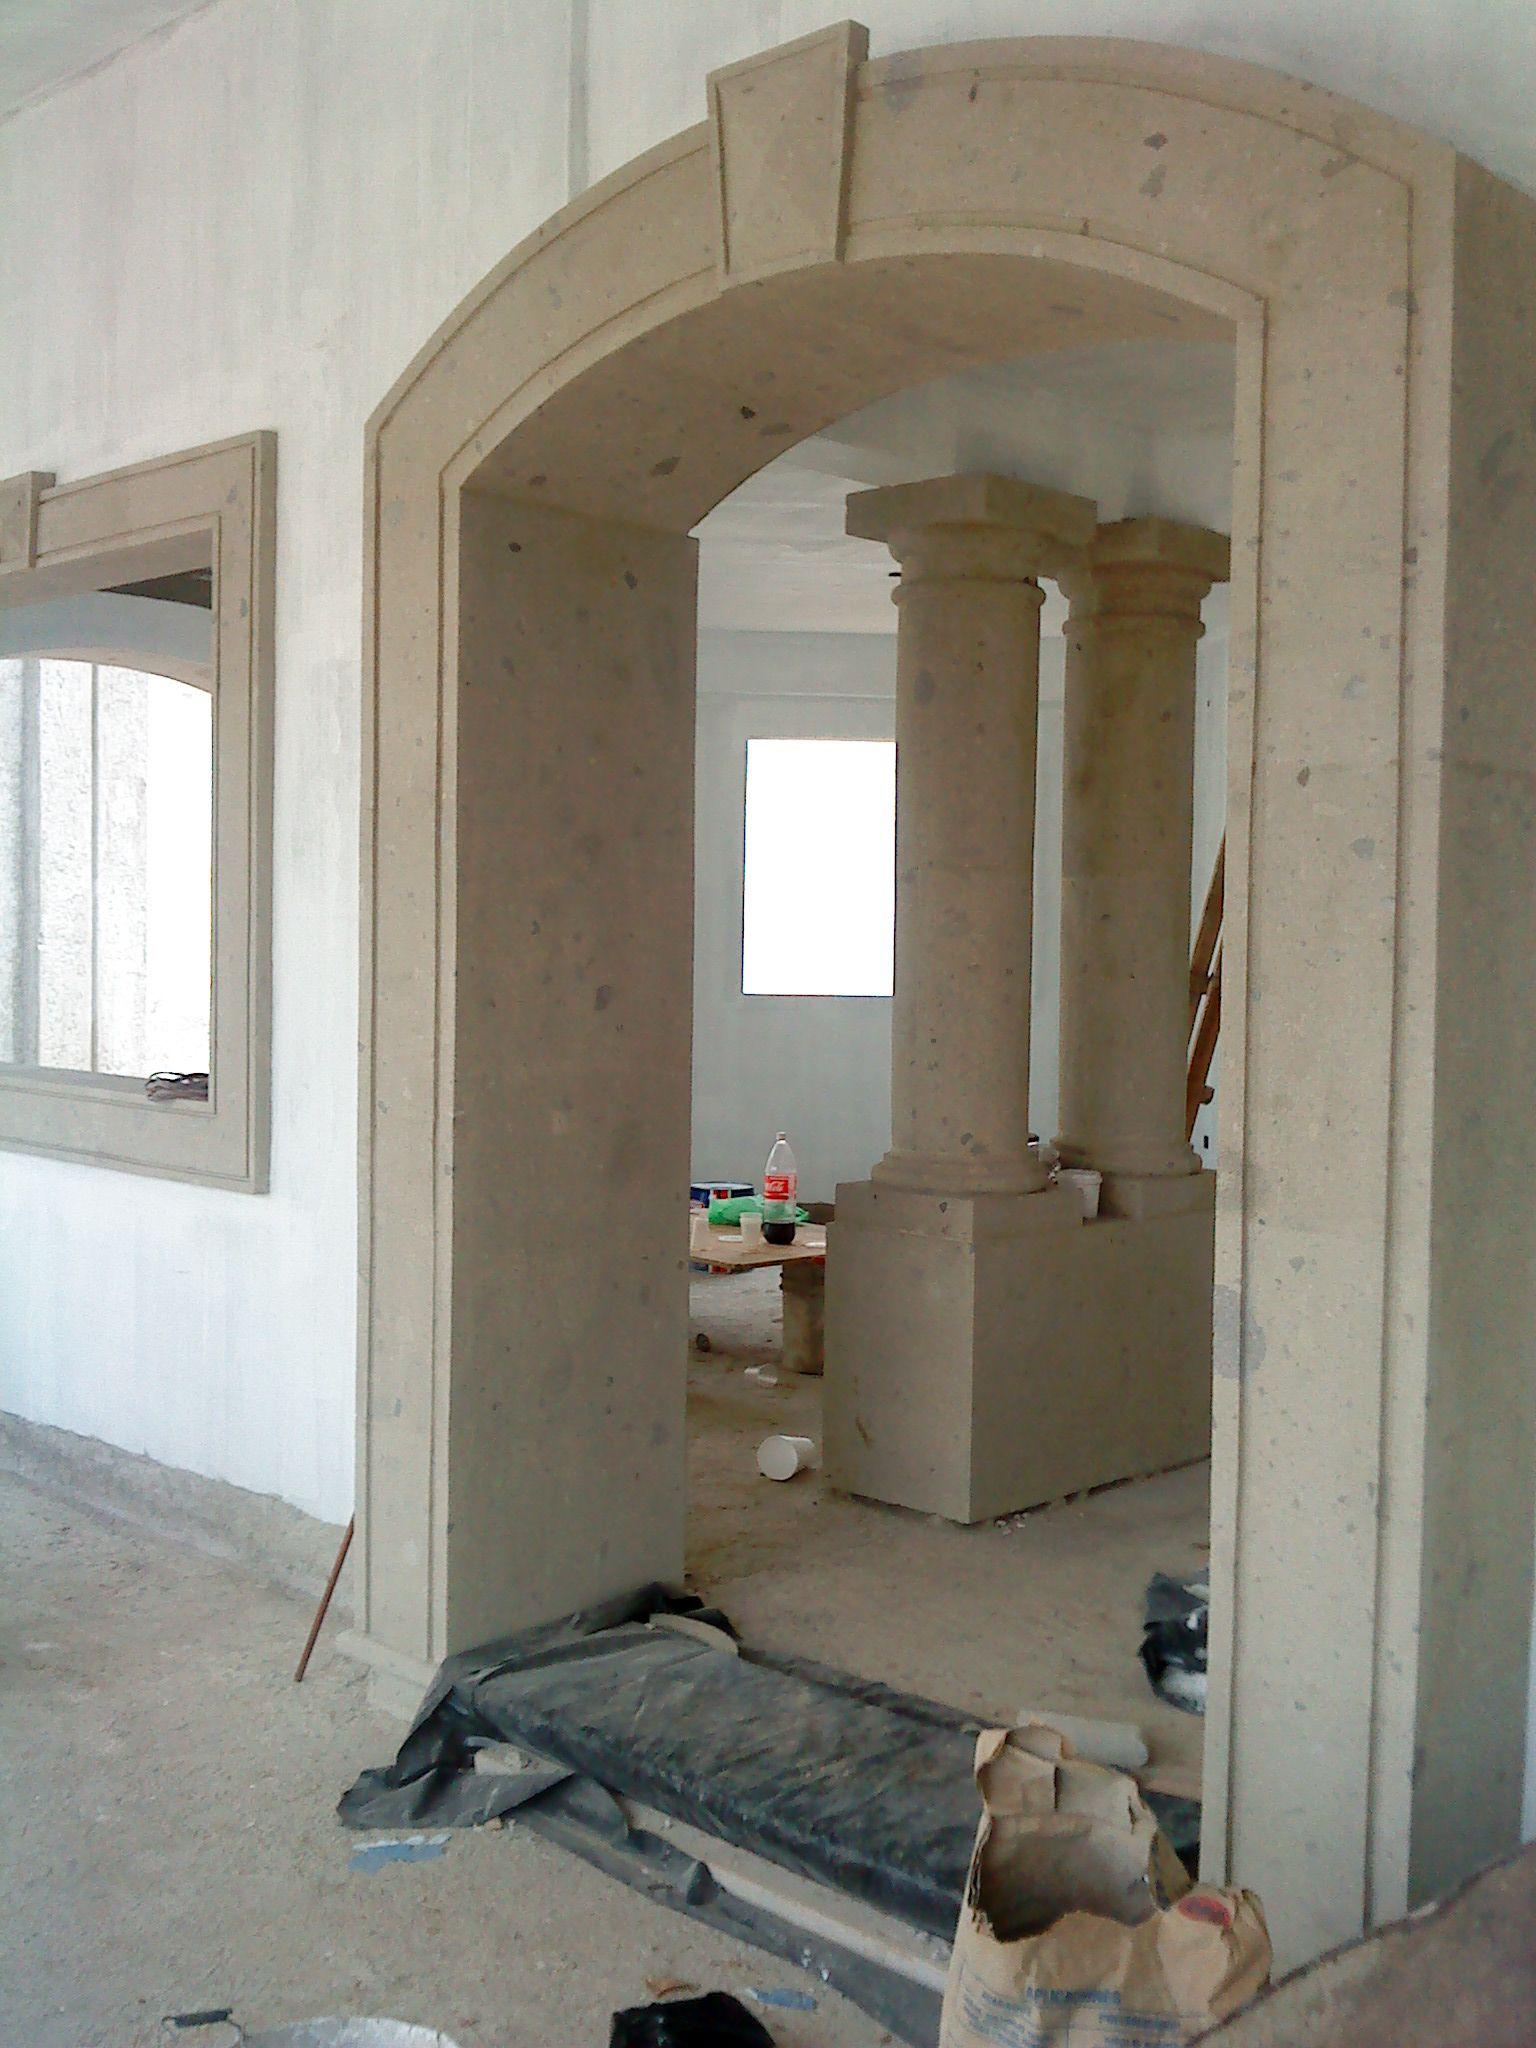 Trabajos en cantera arteproyectos pinterest m s - Casas decoradas con piedra natural ...